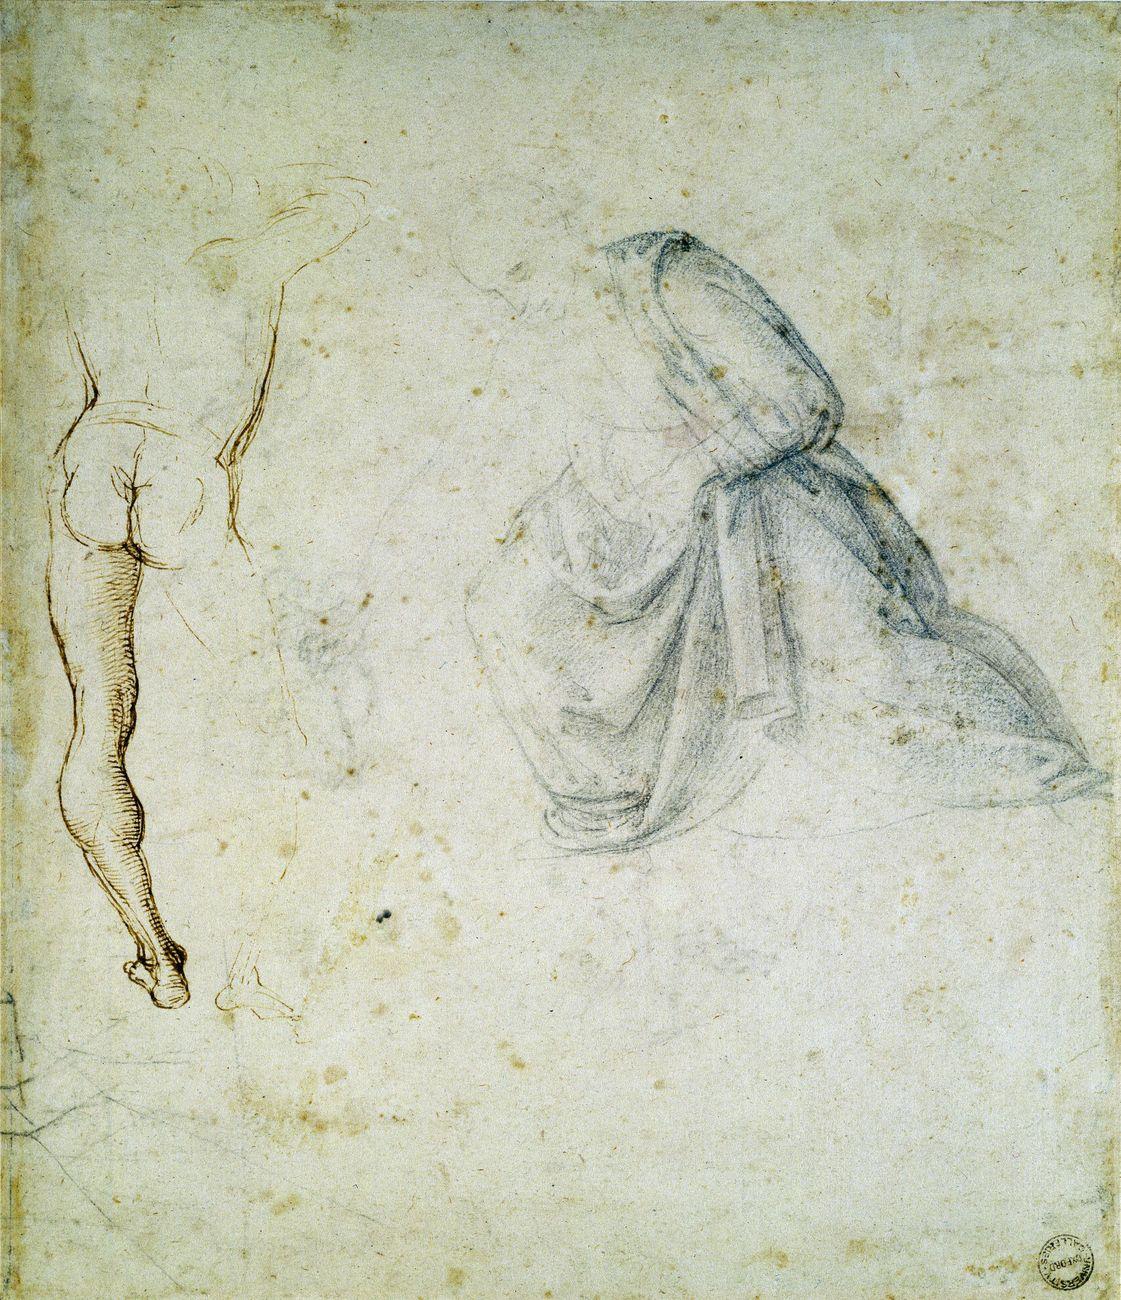 Raffaello, studio preparatorio Stendardo SS. Trinità, Oxford, Ashmolean Museum